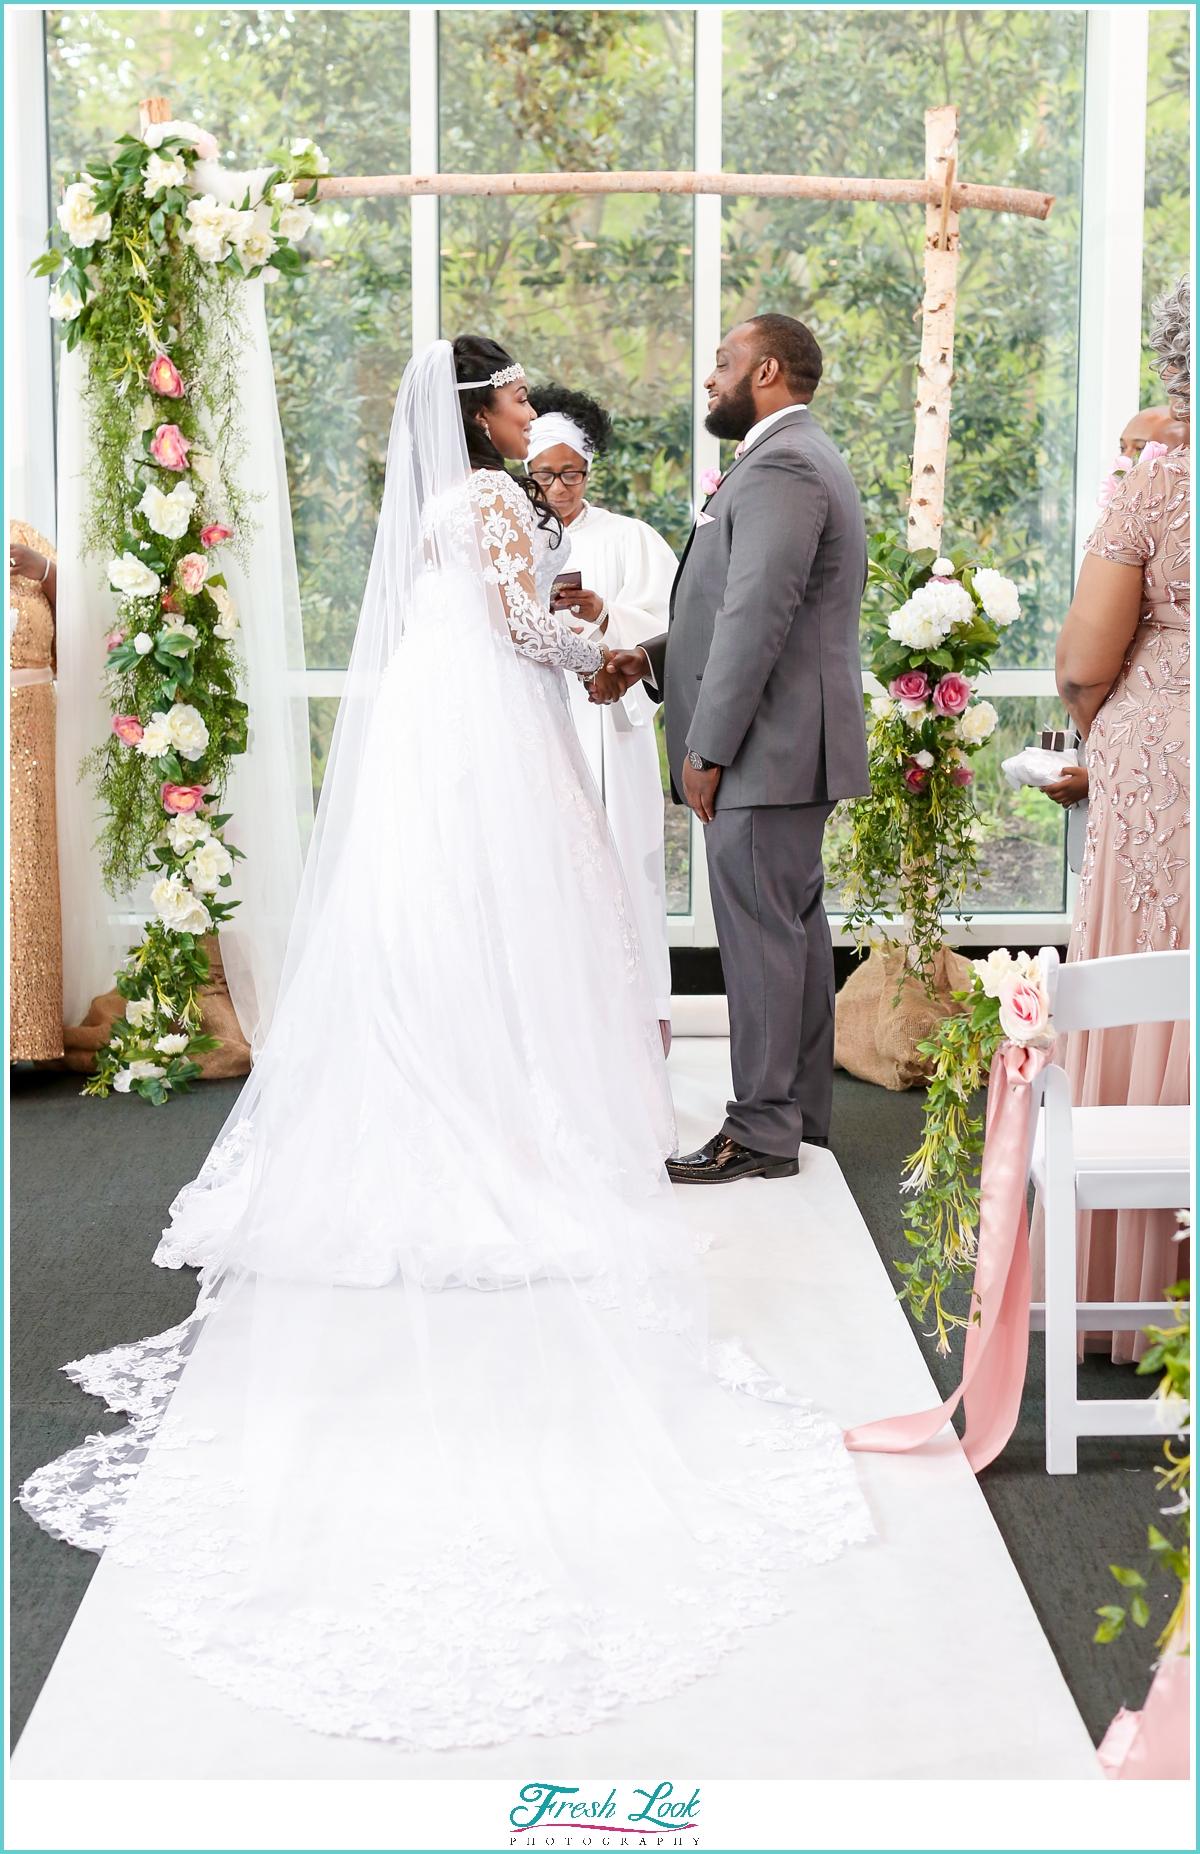 Virginia Beach wedding ceremony